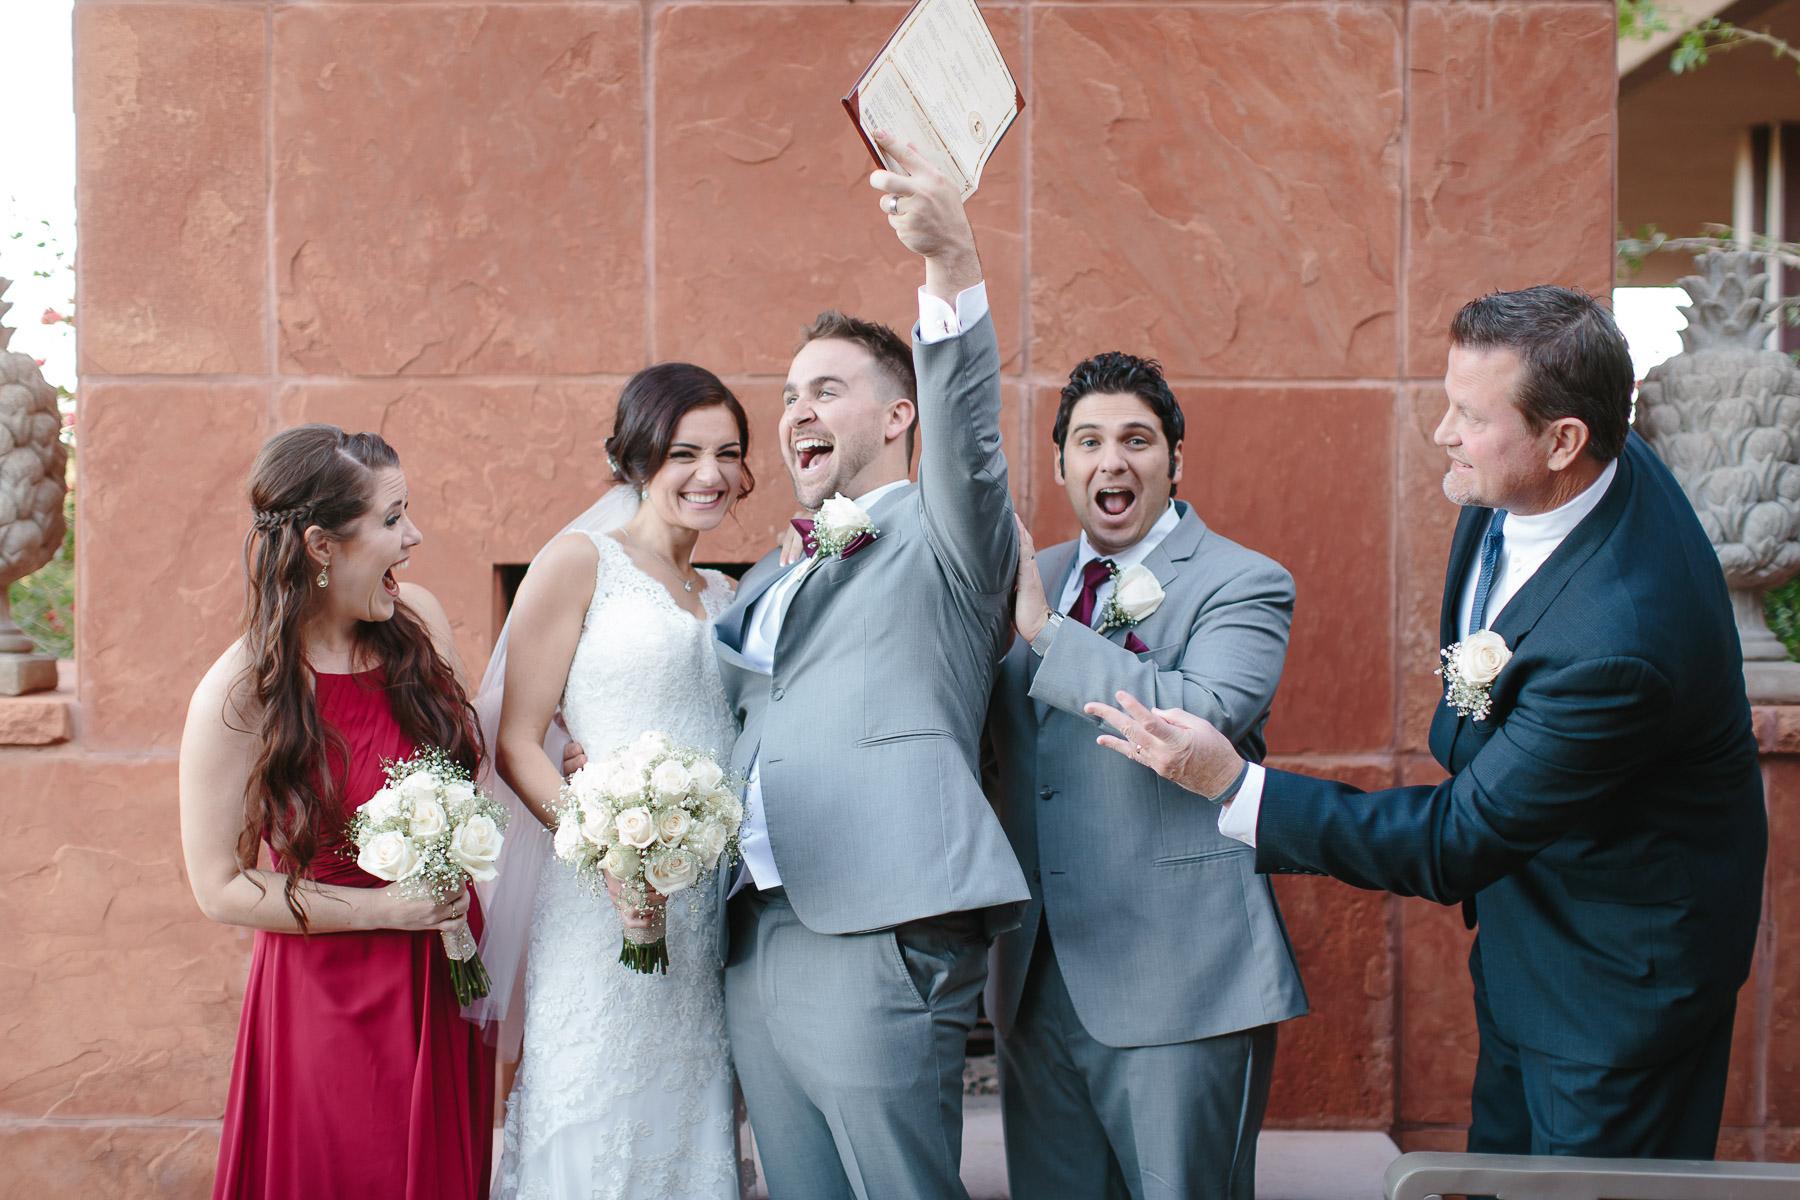 161210-Luxium-Weddings-Arizona-Matt-Jenny-Anthem-Golf-Country-Club-1041.jpg